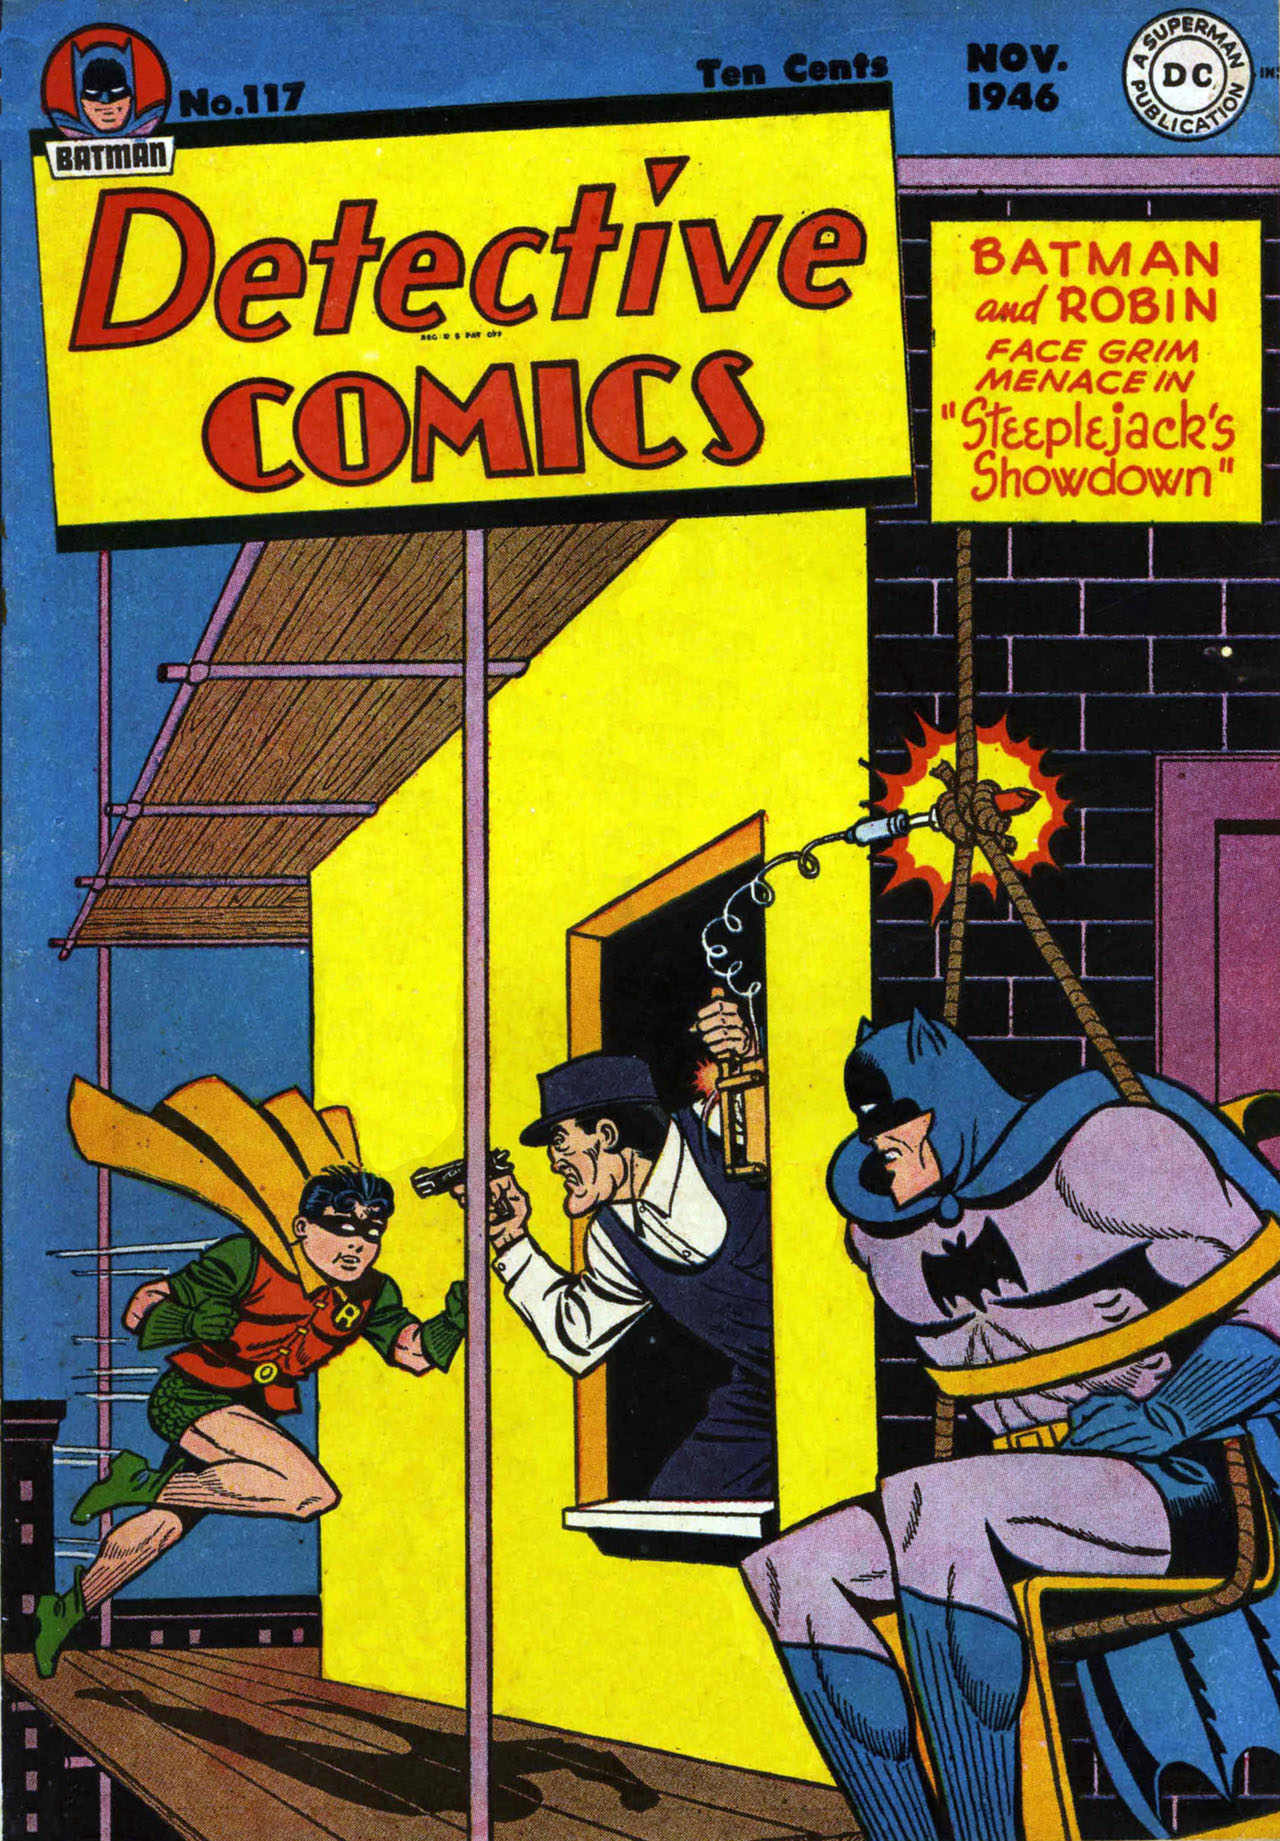 Read online Detective Comics (1937) comic -  Issue #117 - 1